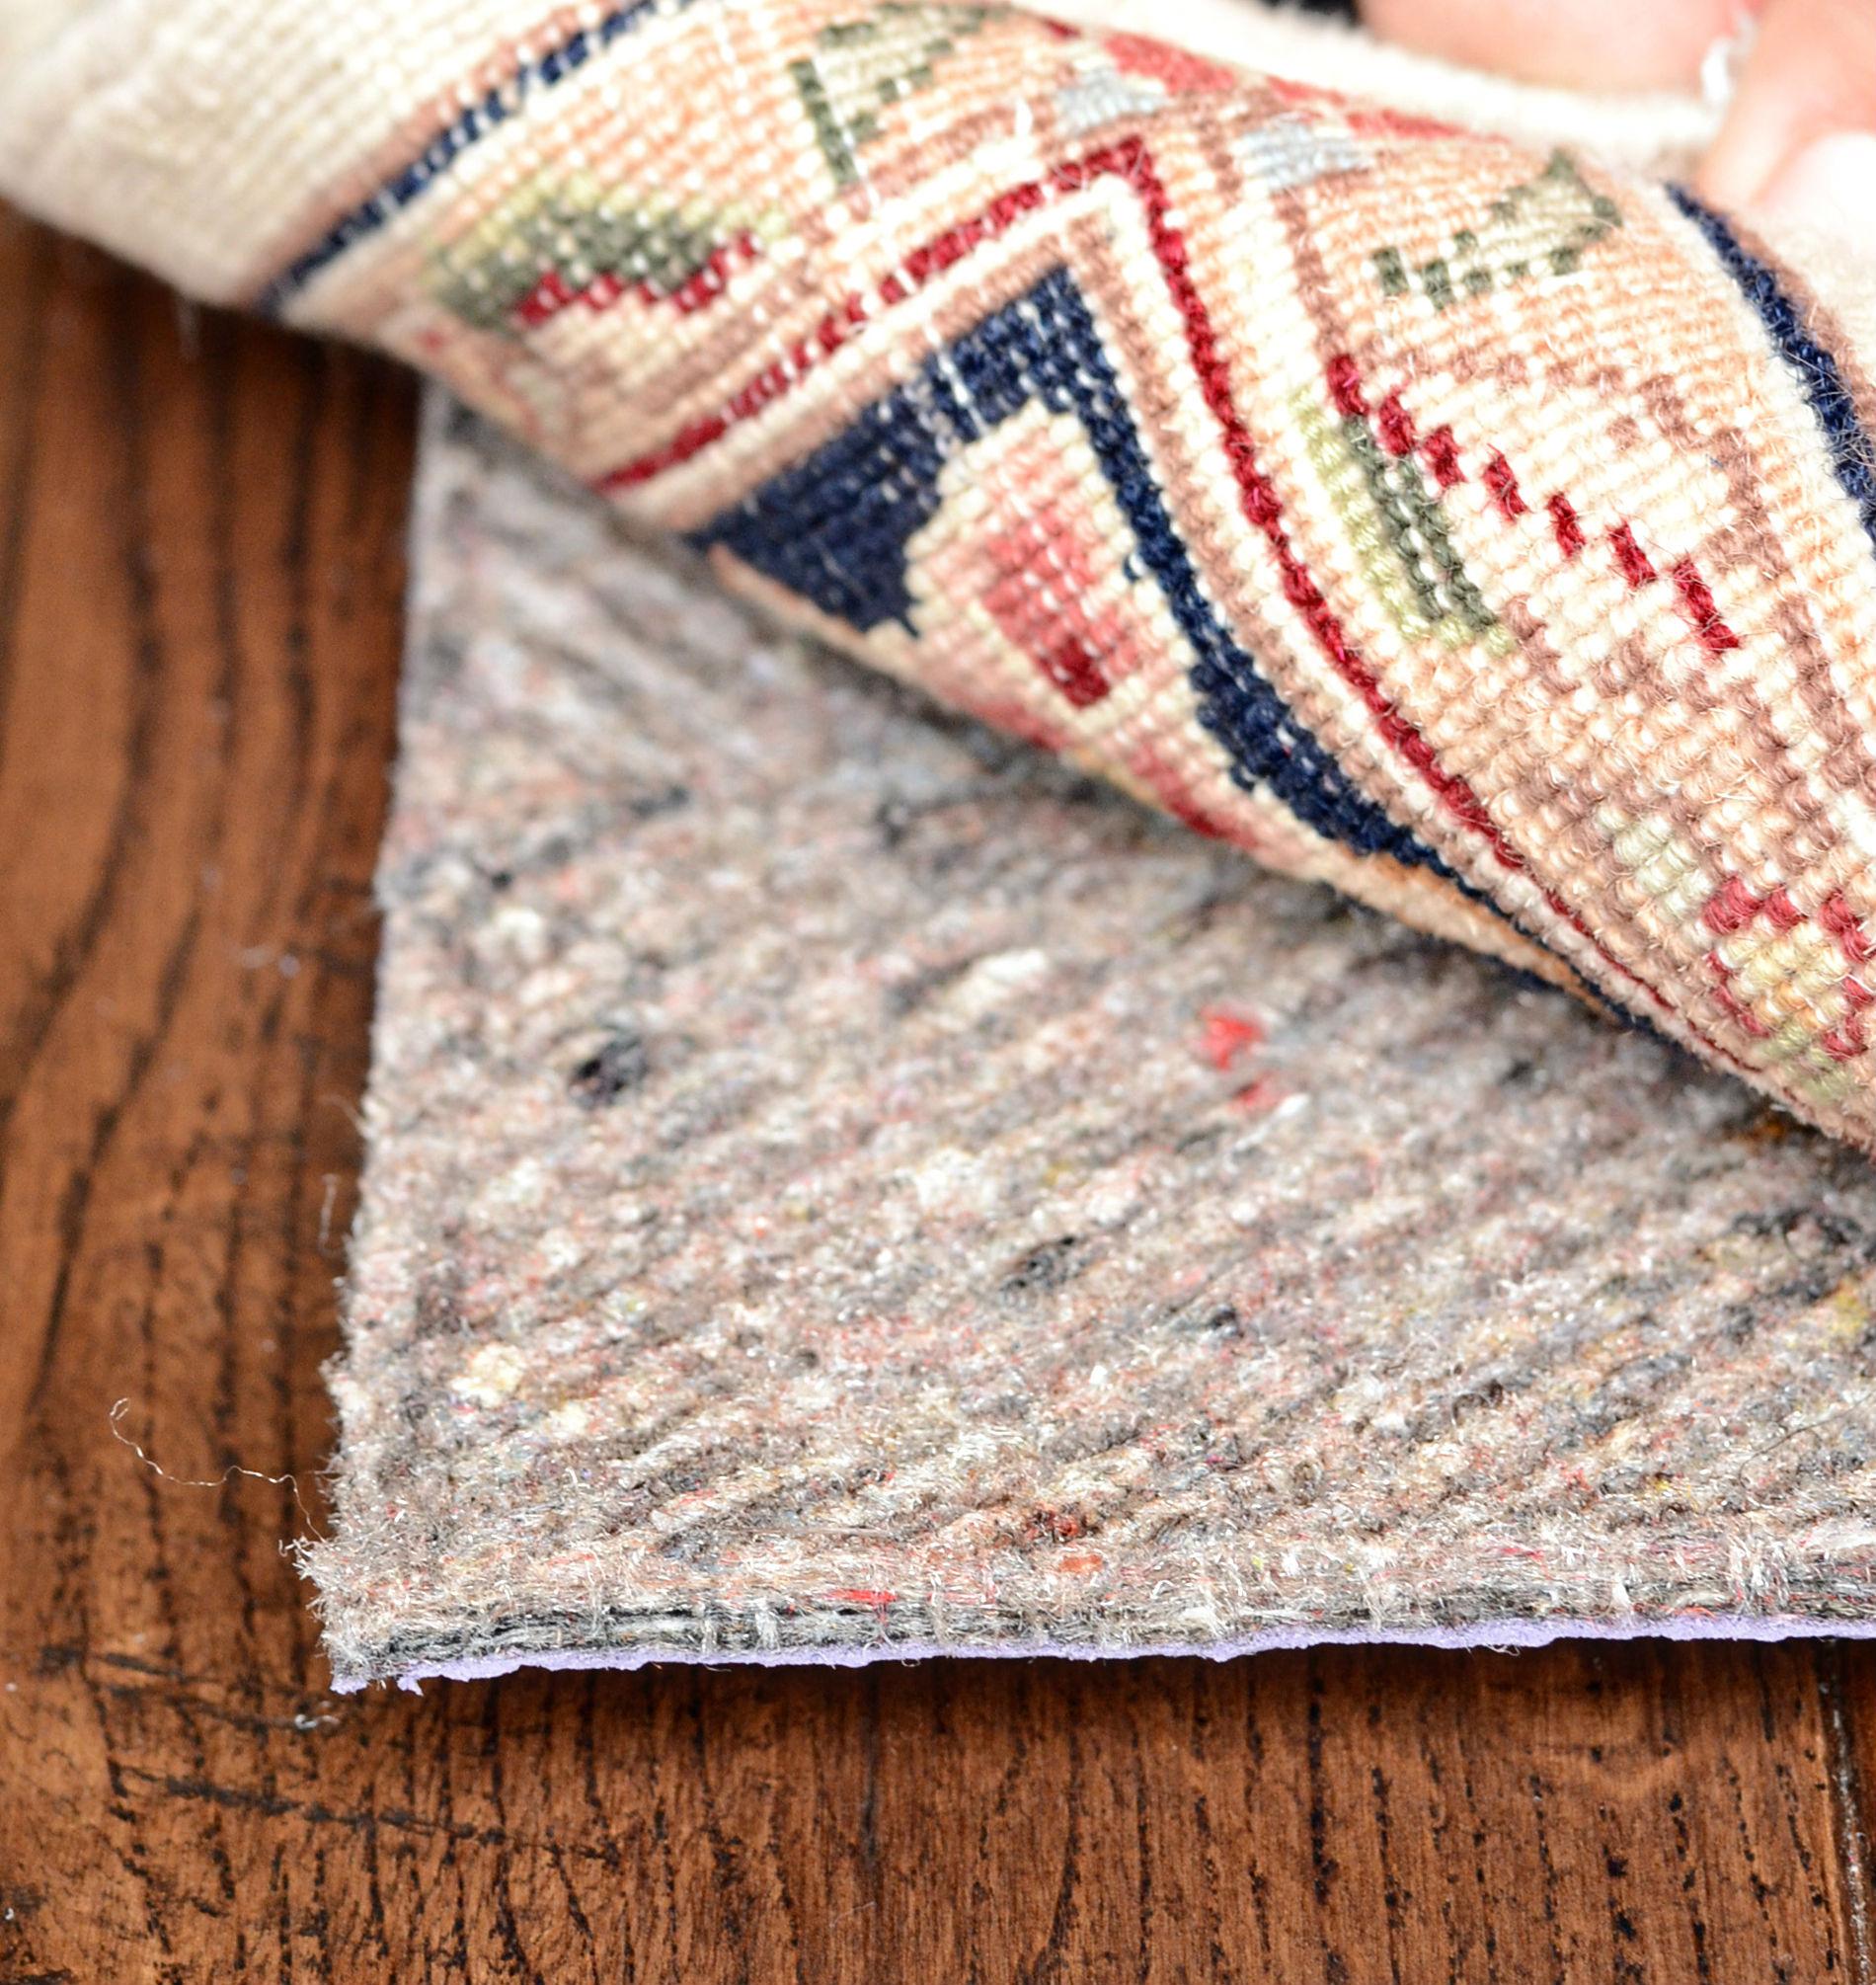 felt rug pads for hardwood floors home design ideas